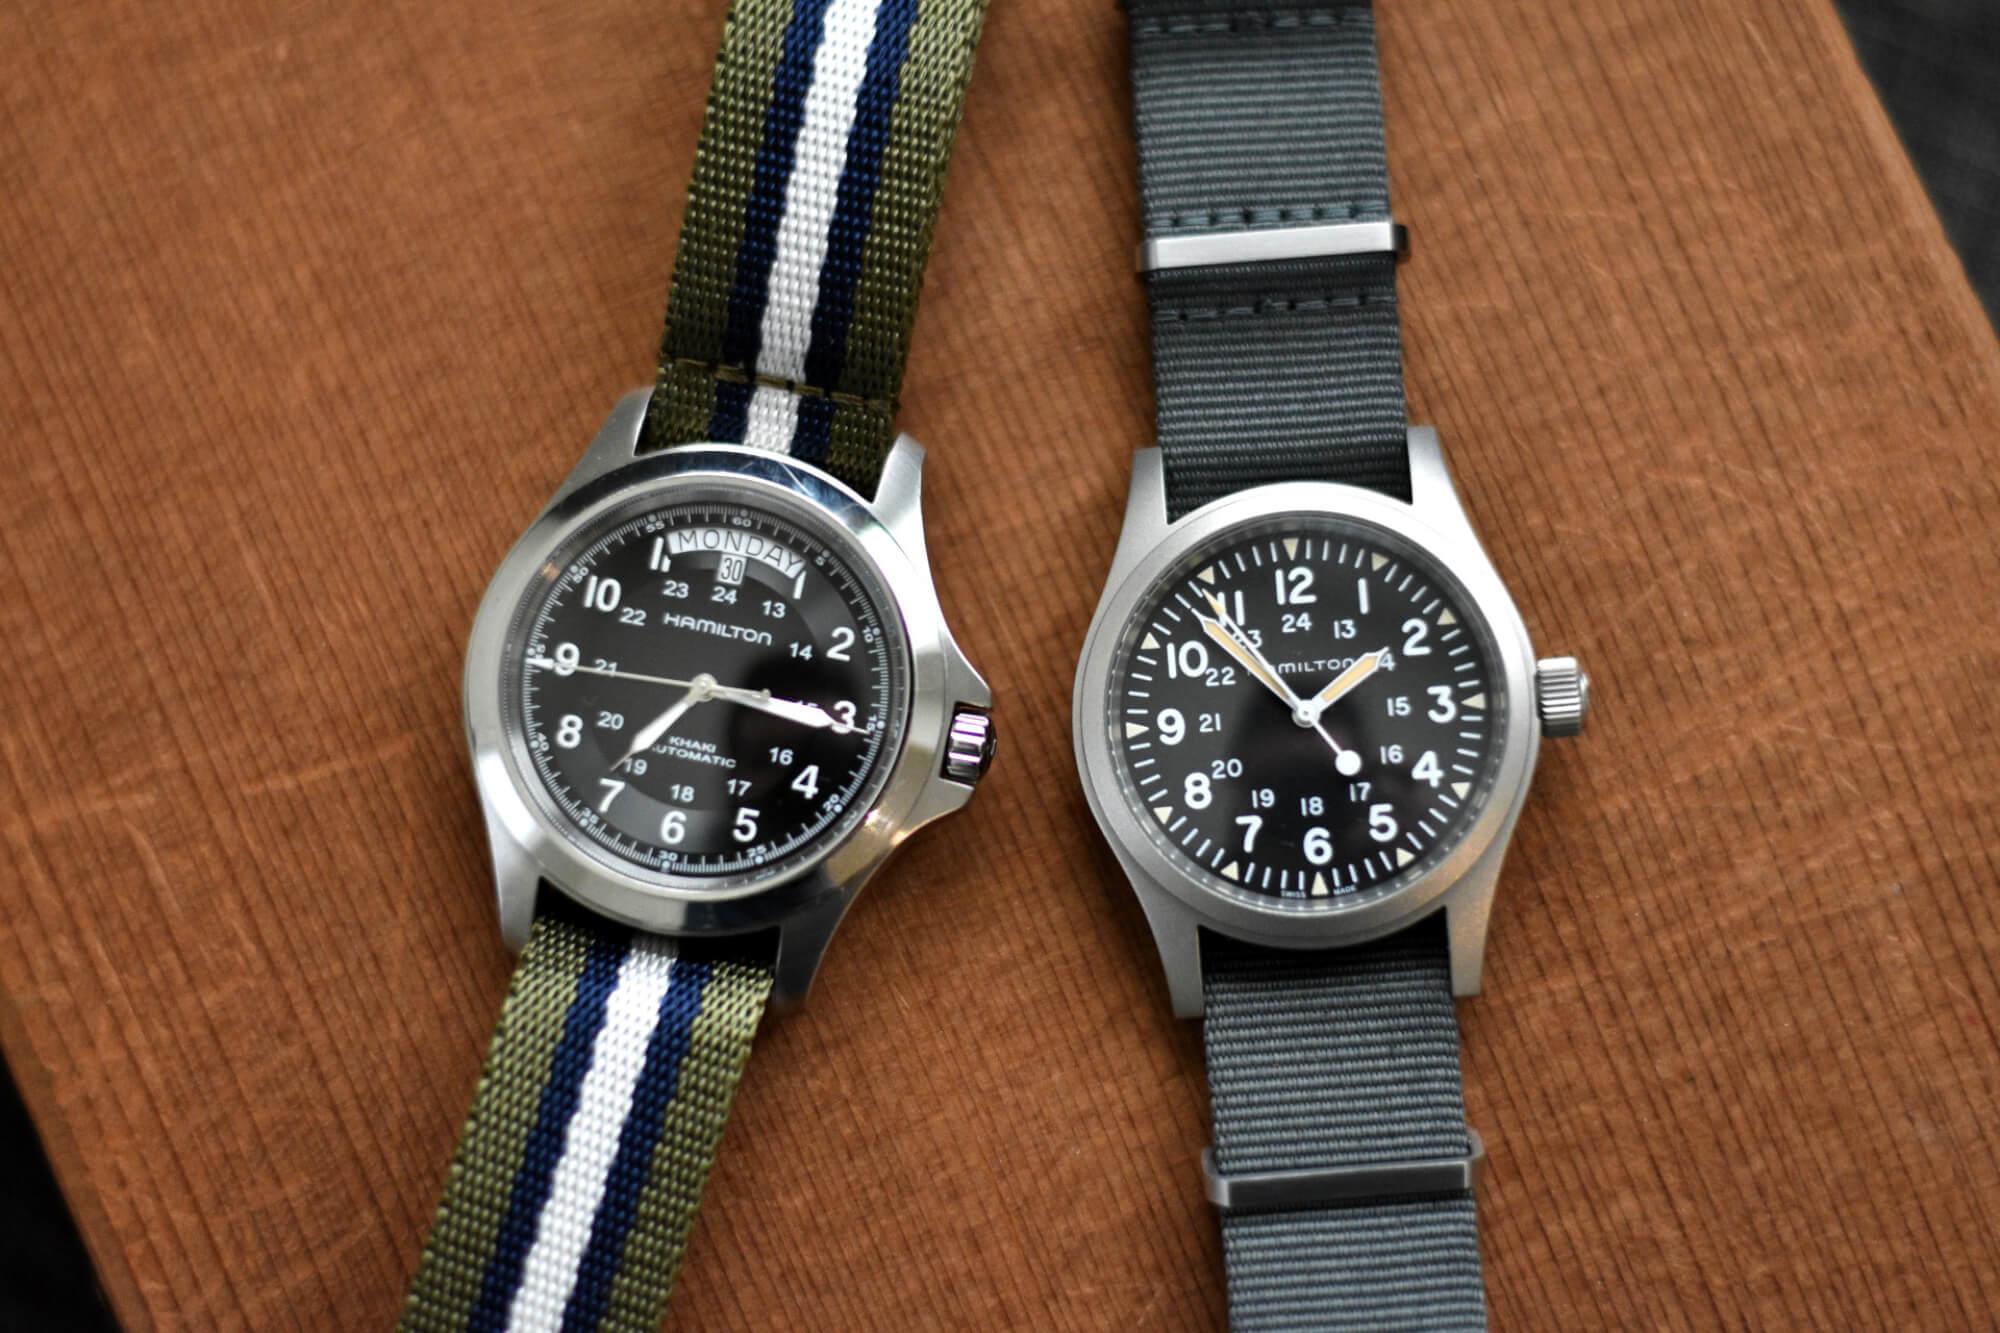 Hamilton-Watches-Group-field-watch